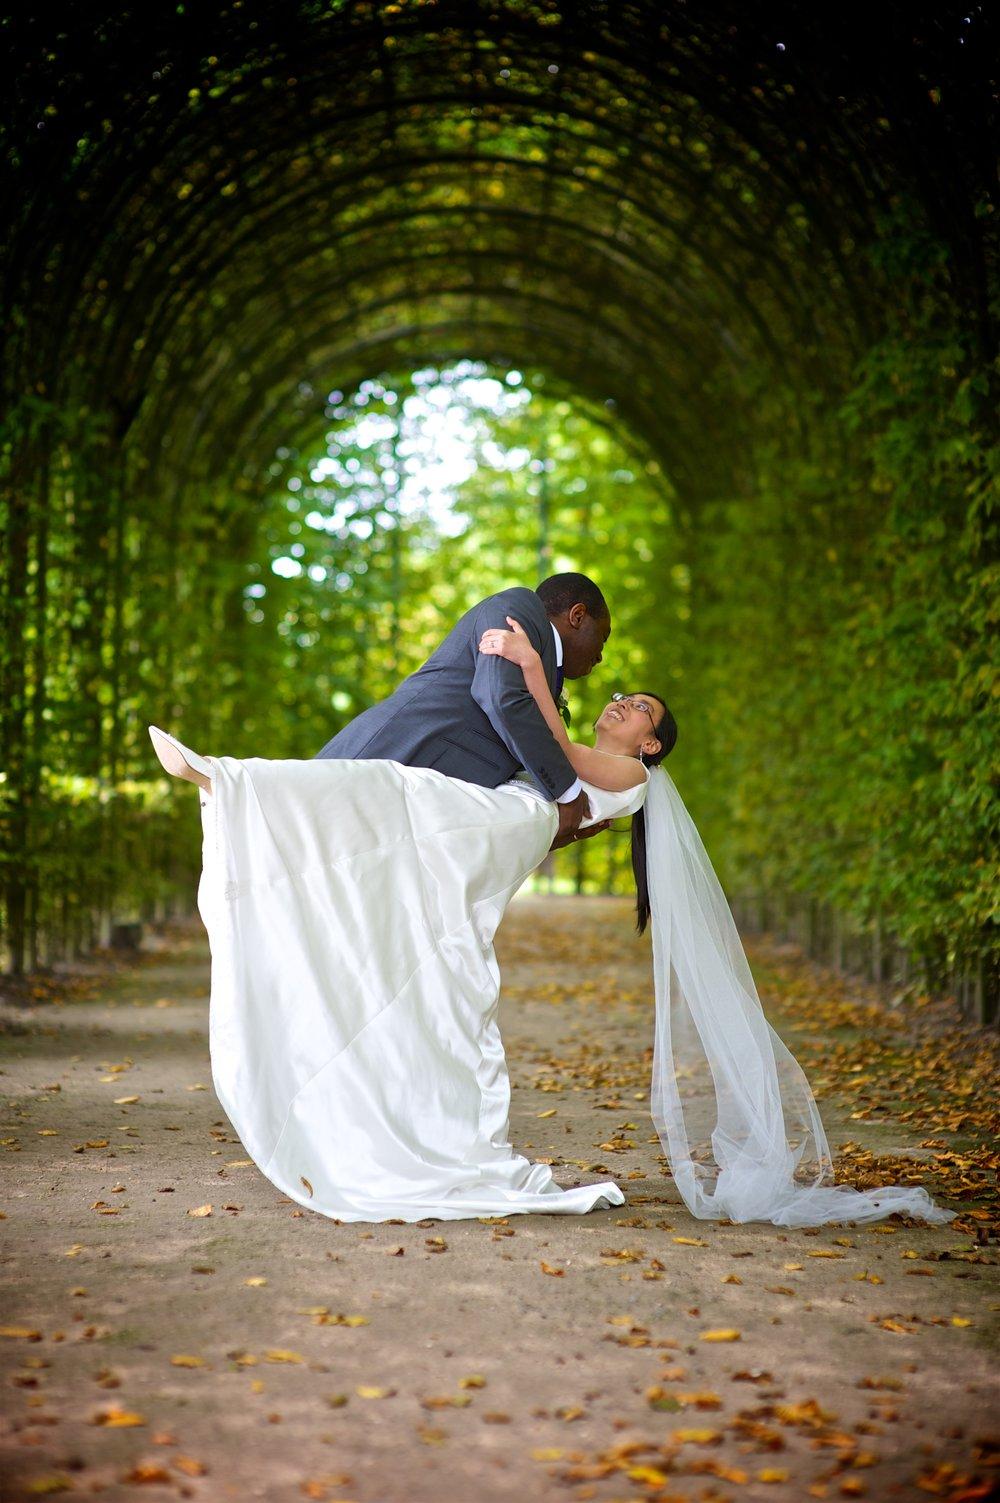 Isaac & Cindy's Wedding Day 259.jpg